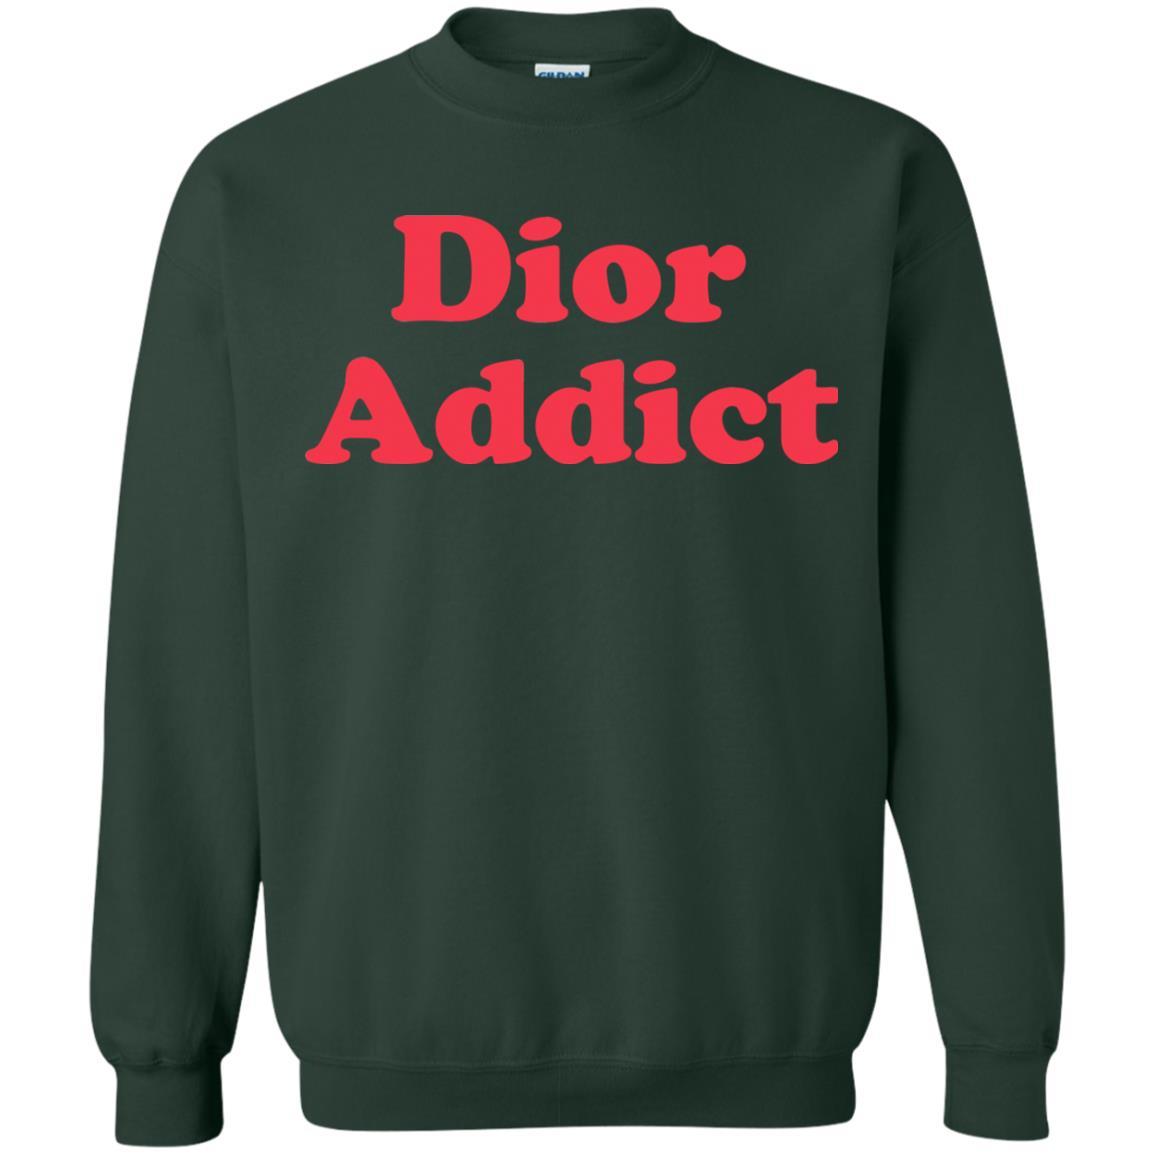 Dior Addict T Shirt - 10% Off - FavorMerch